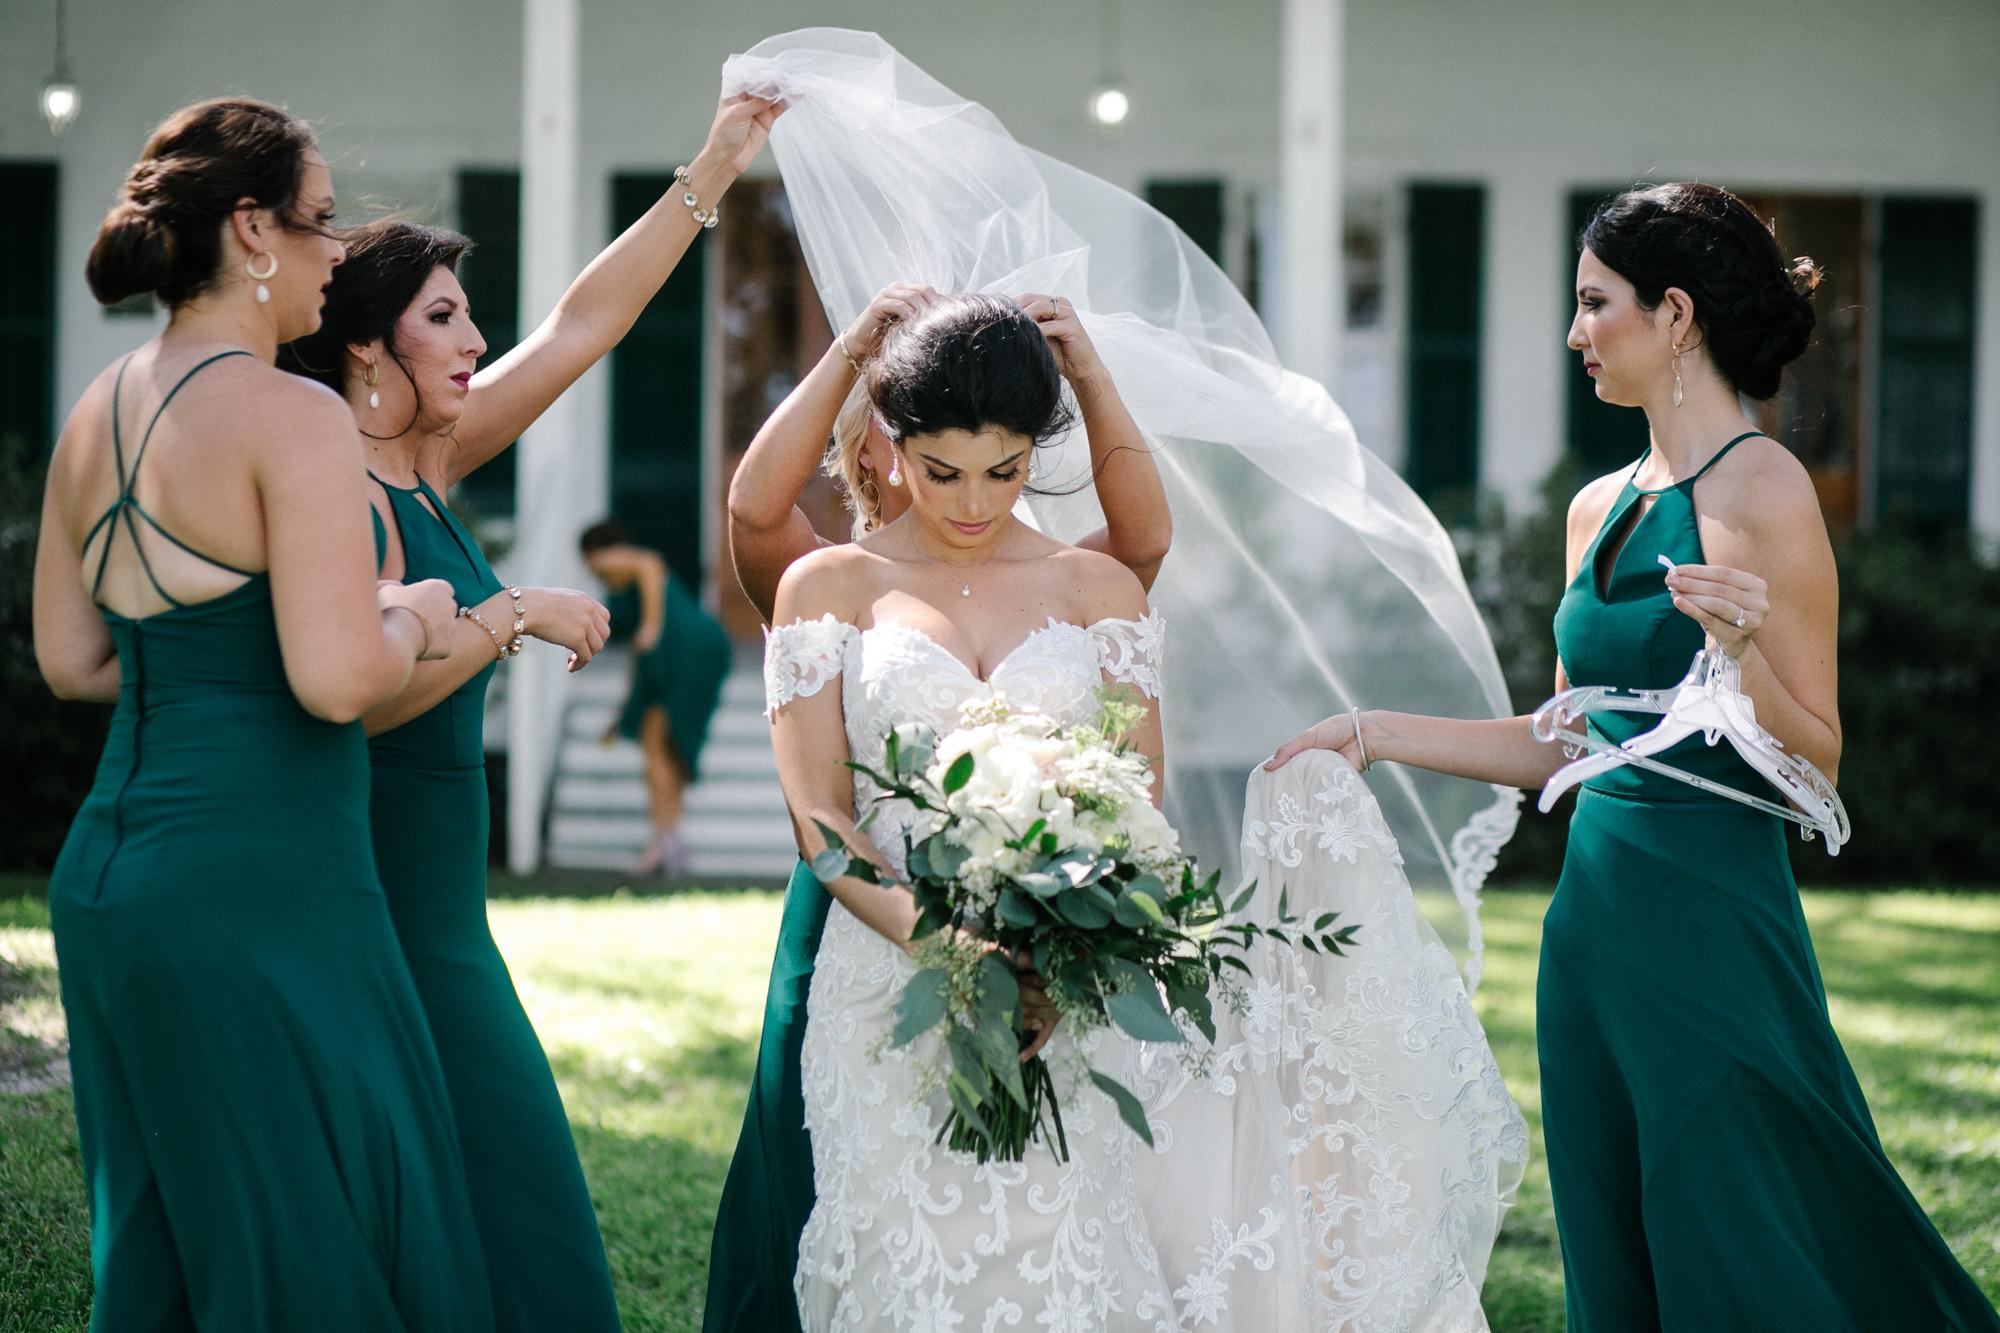 Gautier_Wedding_Photographer-45.jpg